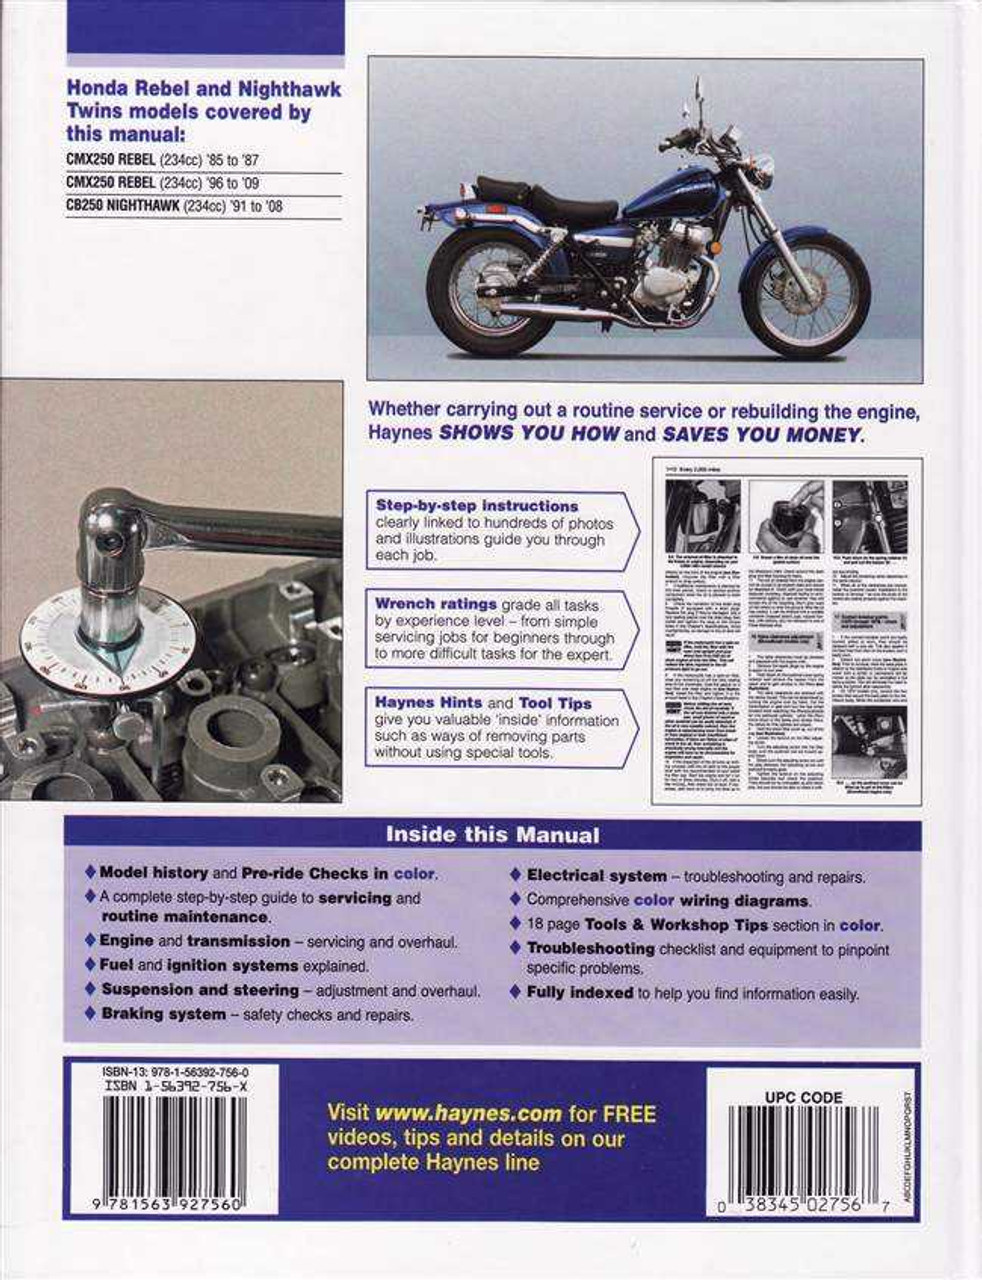 honda cmx250 rebel cb250 nighthawk twins 1985 2009 workshop manual rh automotobookshop com au 1986 Honda Rebel 250 86 Honda Rebel 250